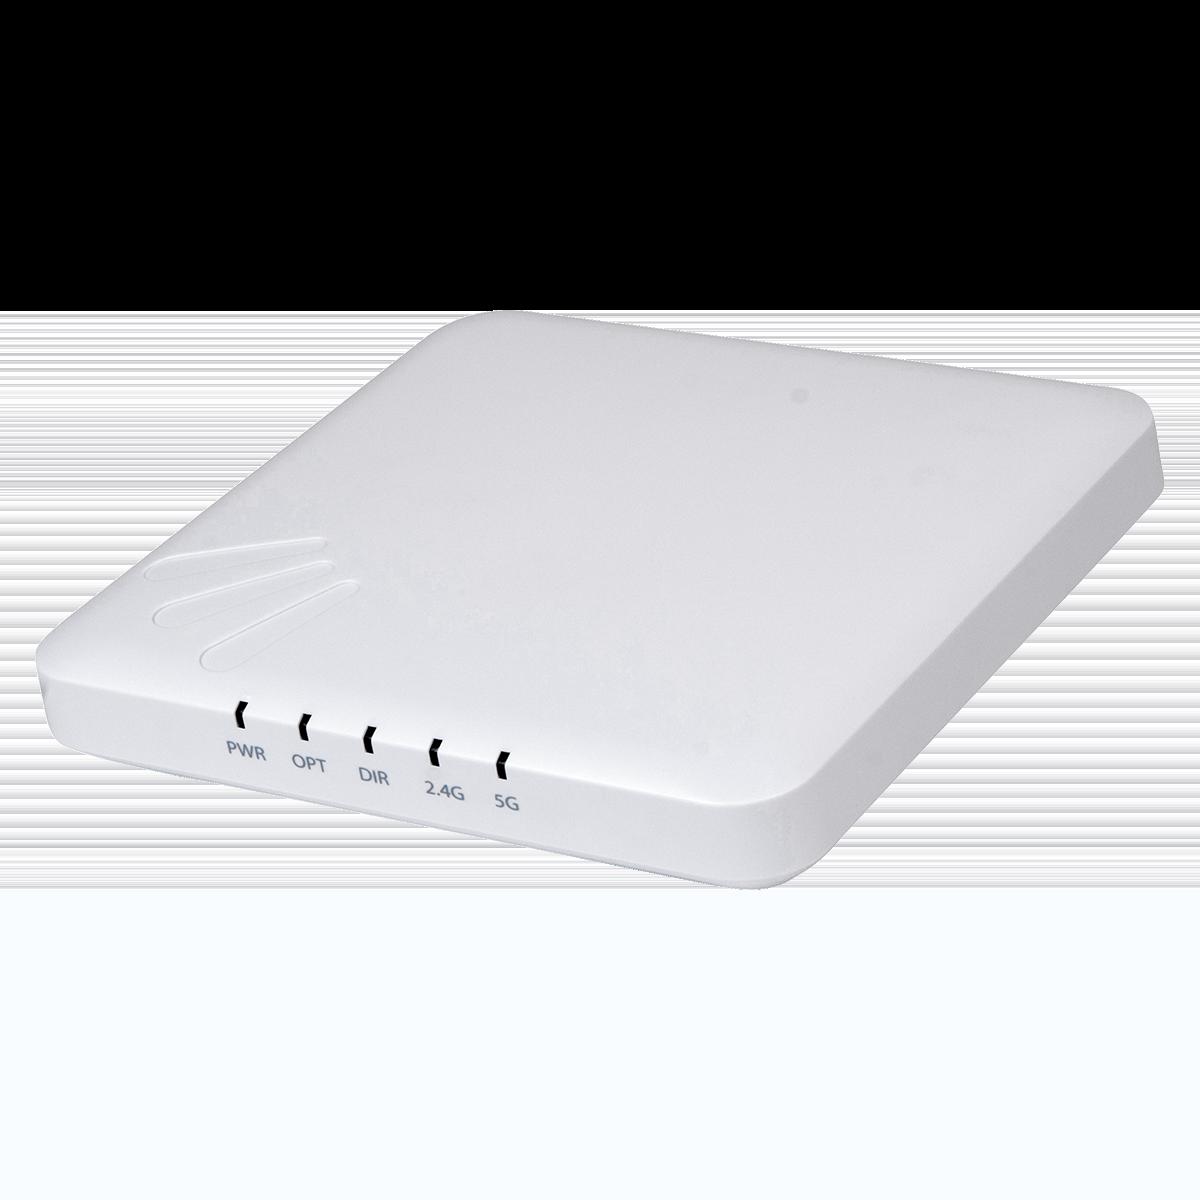 Ruckus ZoneFlex R300 Smart Wi-Fi Access Points with Adaptive Antenna Technology